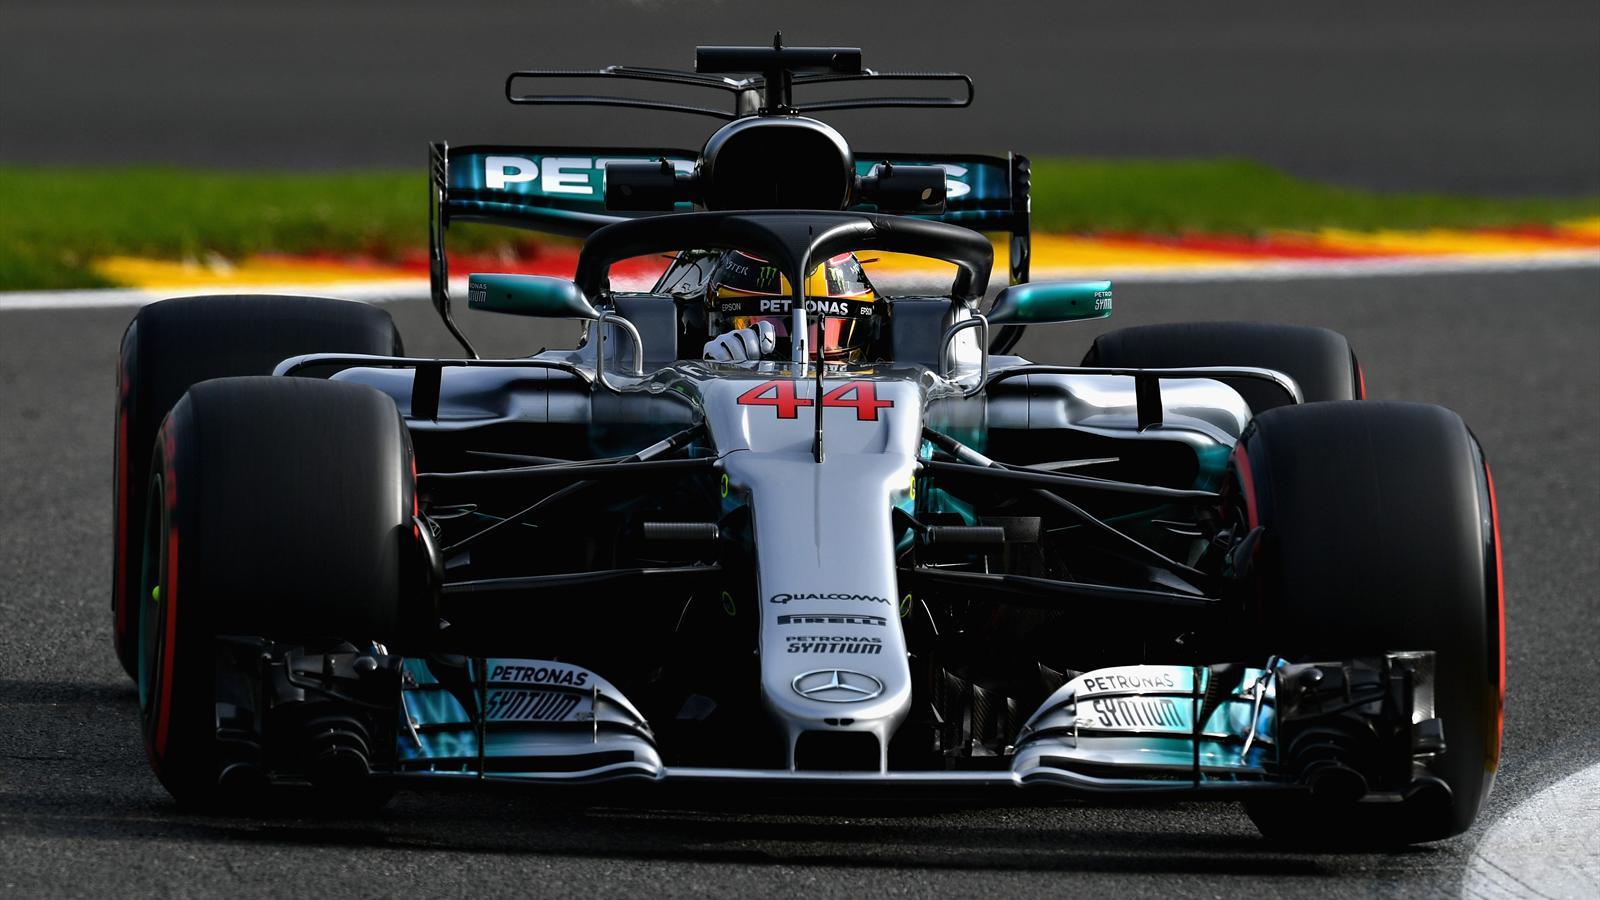 Mercedes To Launch 2018 F1 Car On Same Day As Ferrari